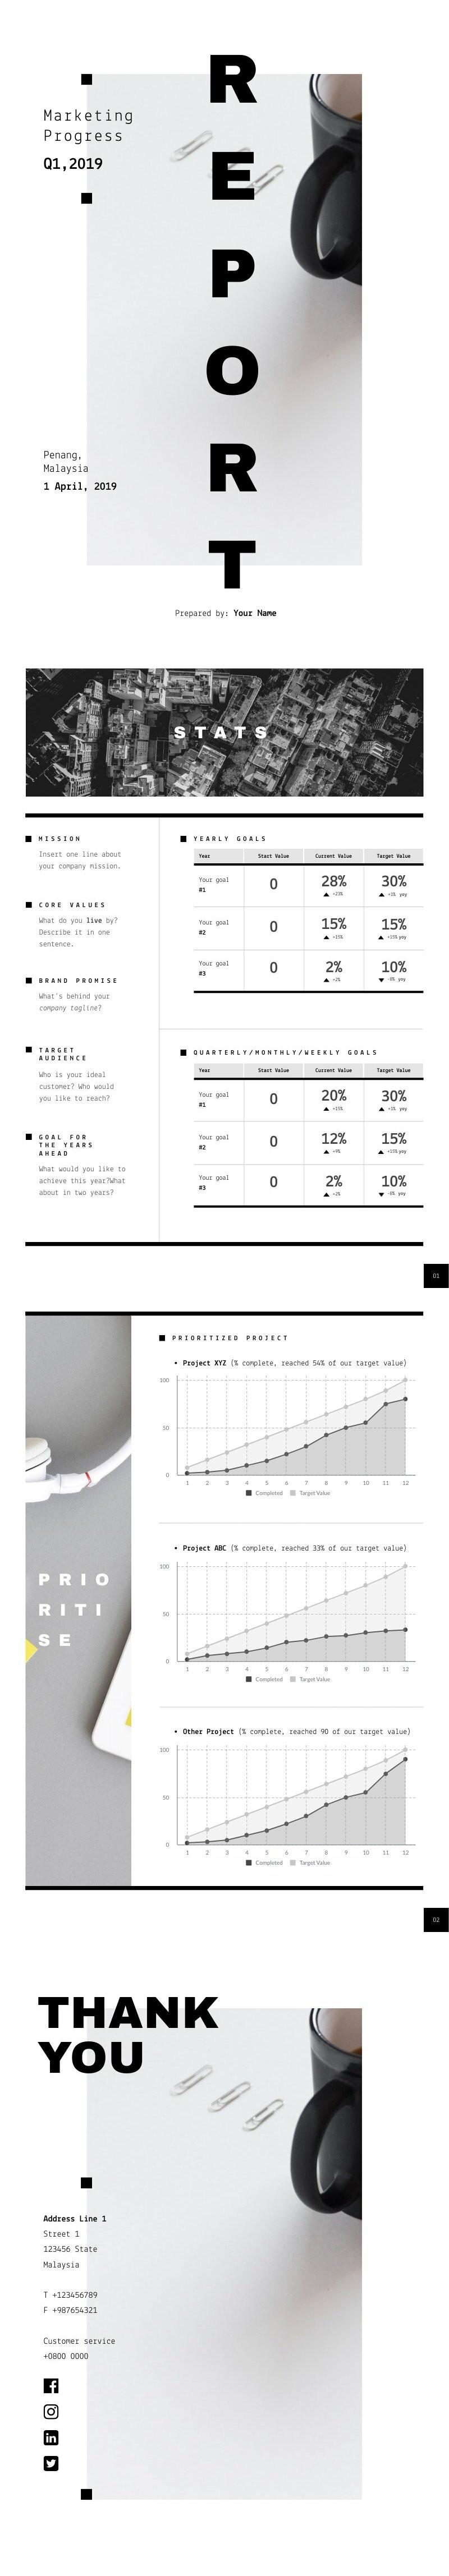 Marketing Progress Report